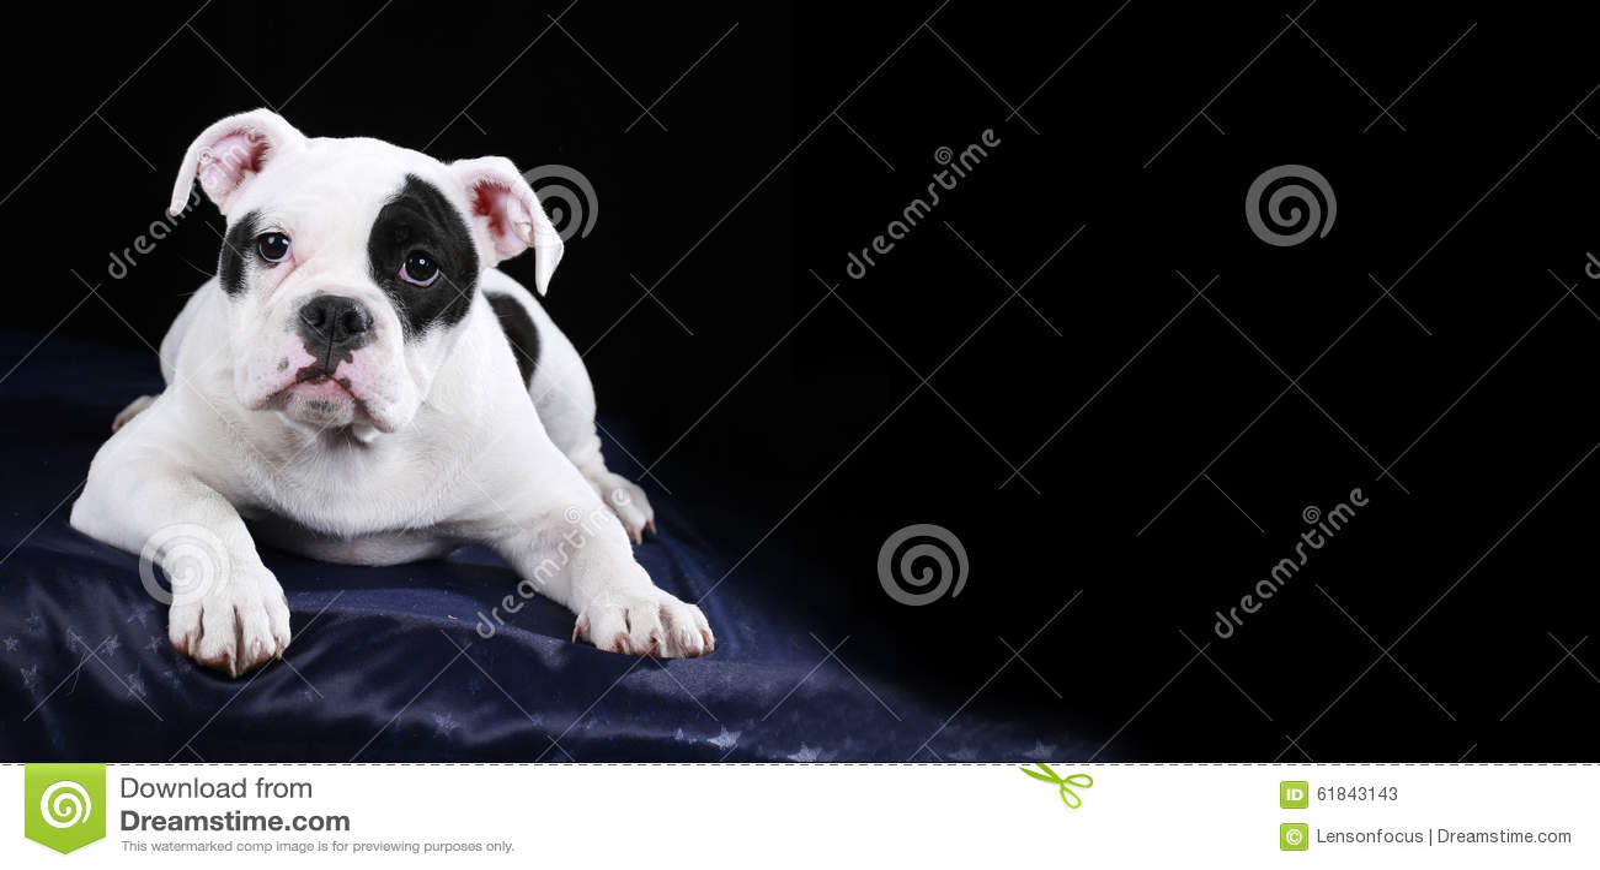 Cute Old English Bulldog Puppy Lying Frontal Stock Image Image Of